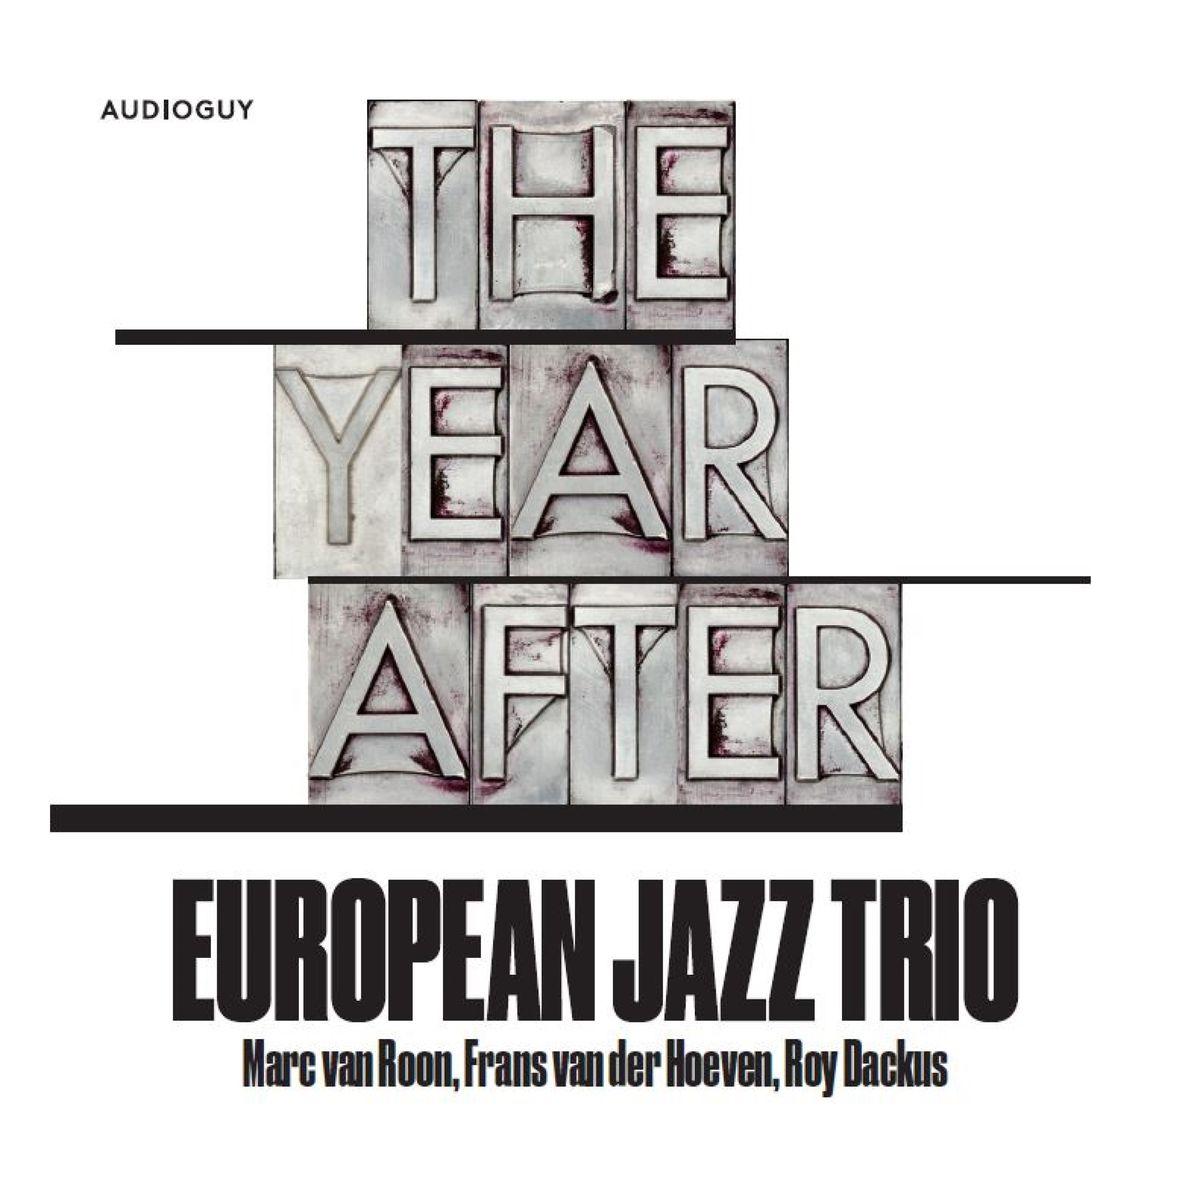 European Jazz Trio - The Year After (2019)